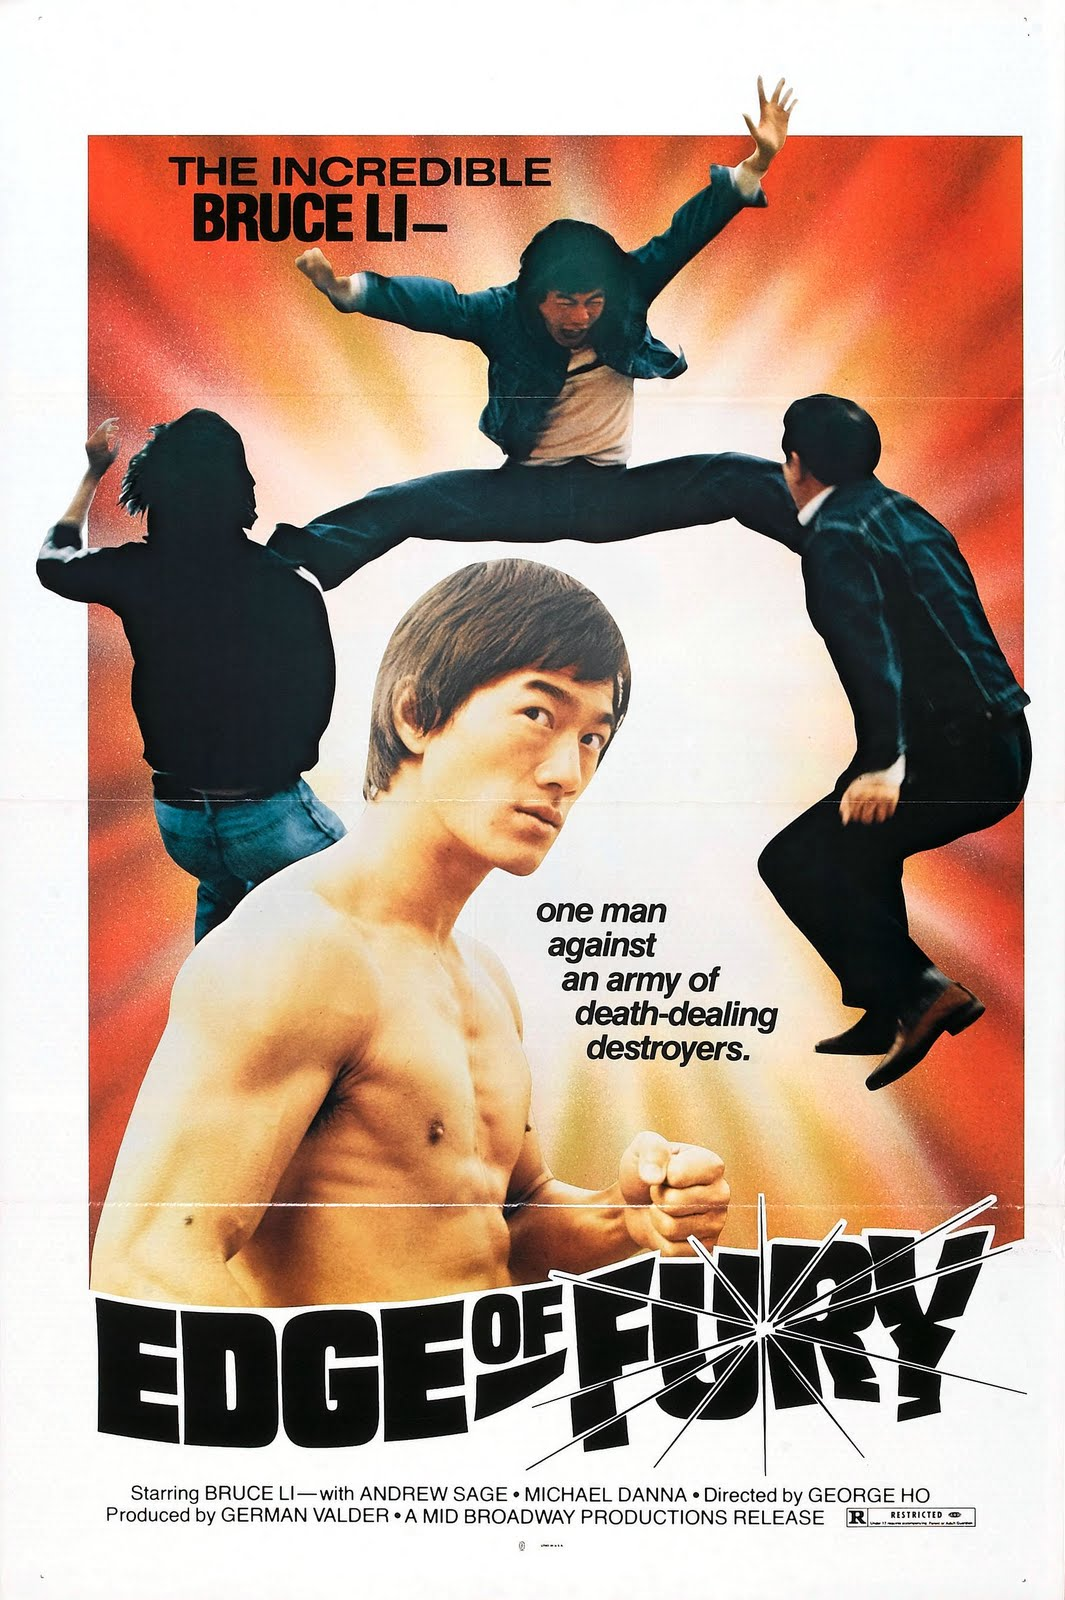 Edge of Fury (1978)